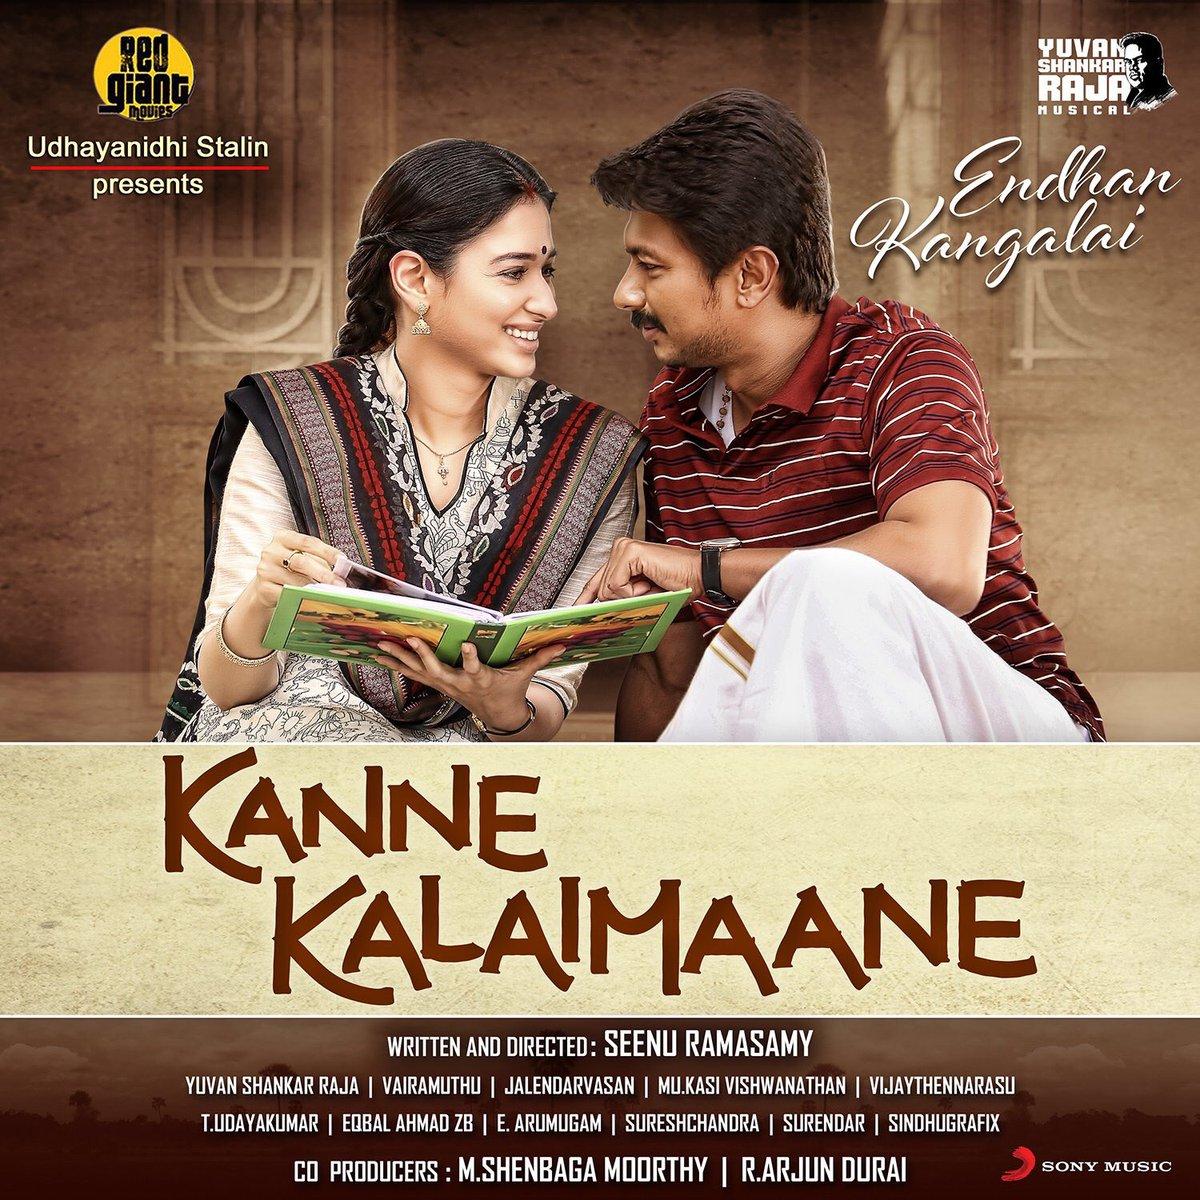 Kanne Kalaimaane releasing on February First Single Track EndhanKangalai melody -composed by yuvan shankar raja